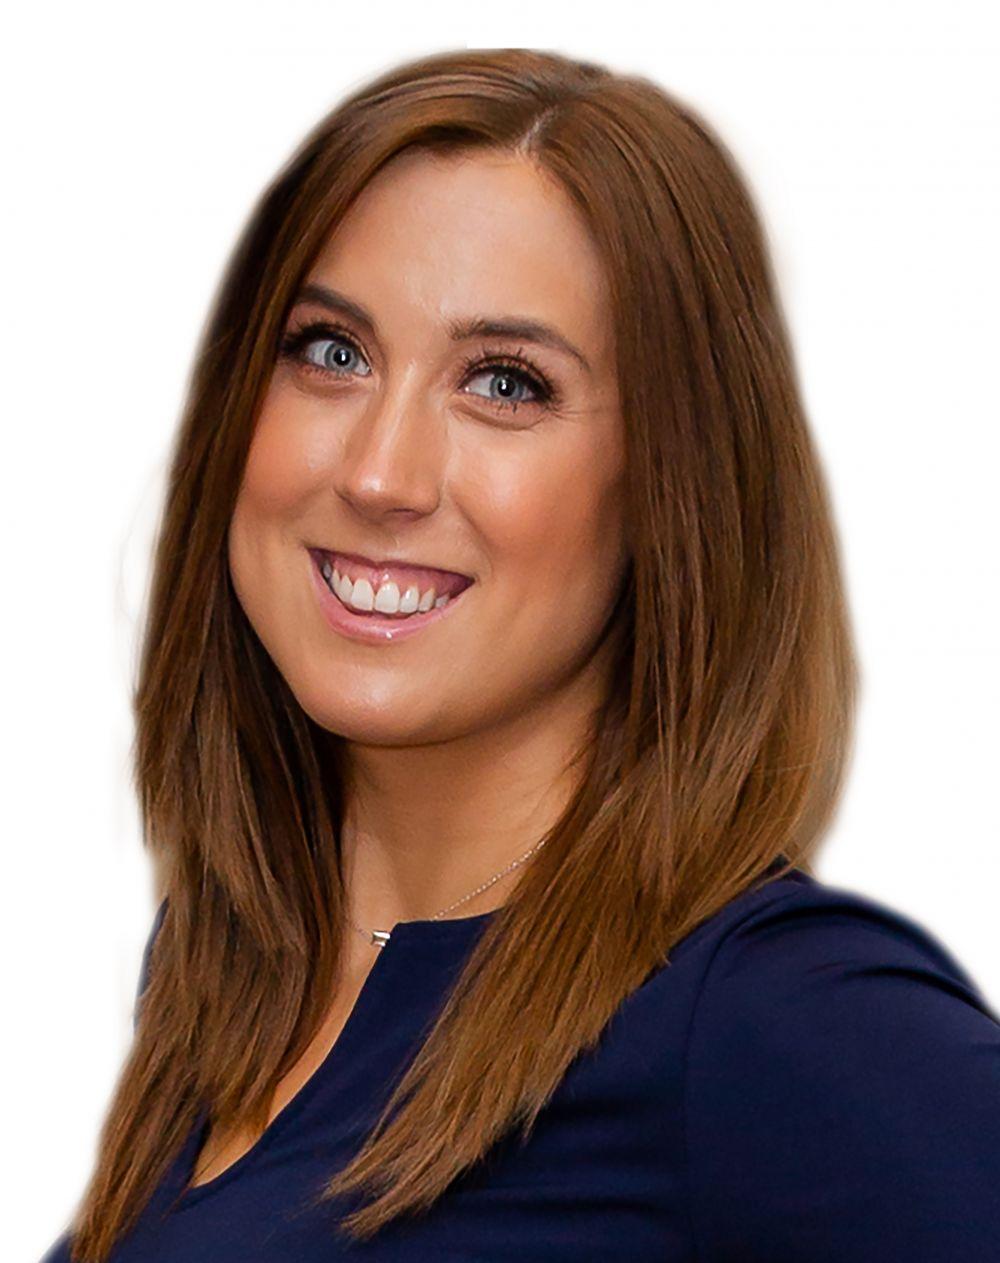 Mandy Whitlock